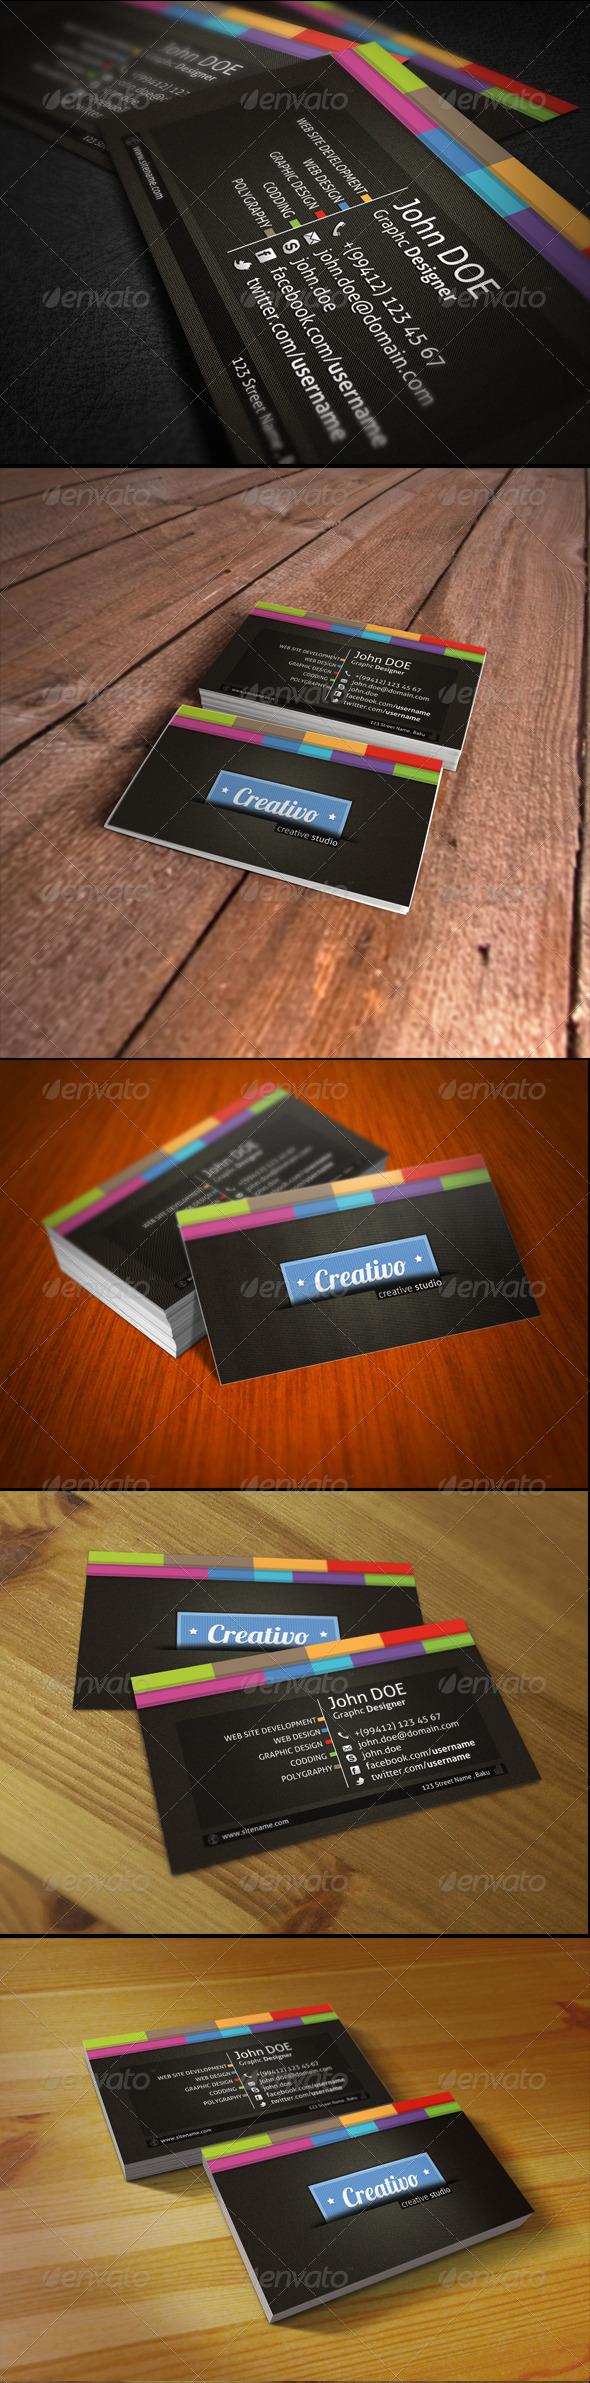 Creativo Business Card - Creative Business Cards